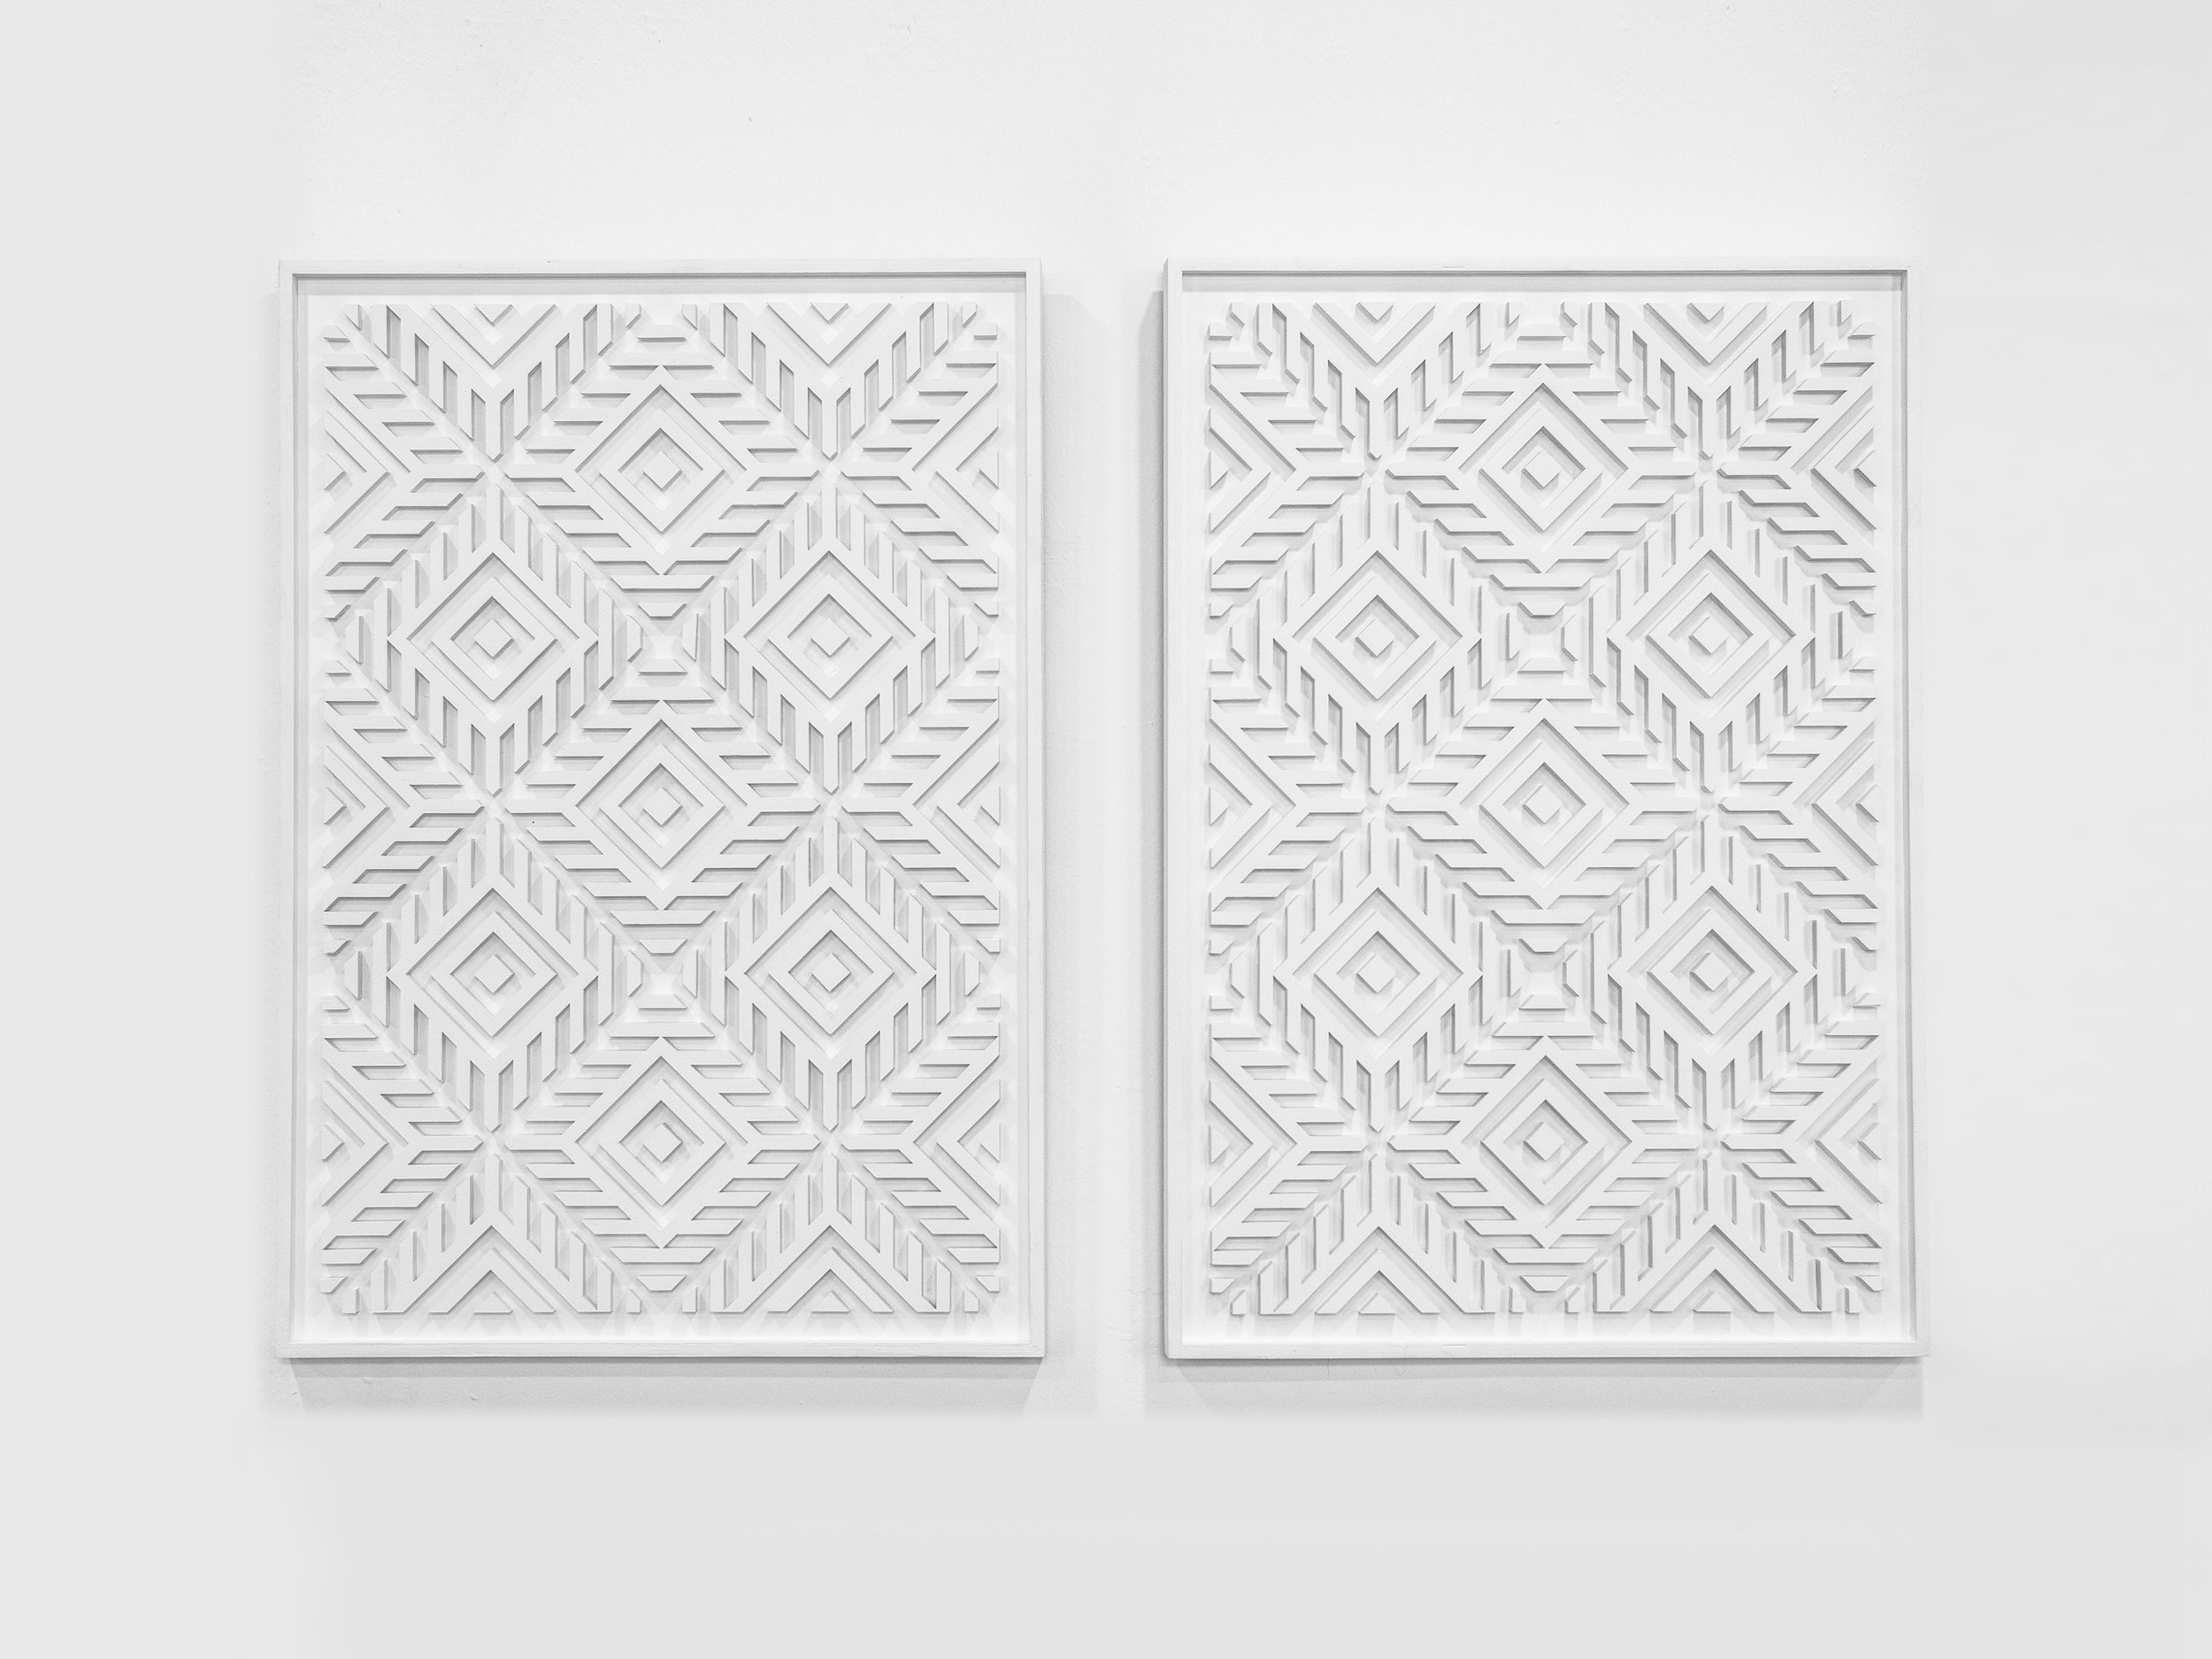 UNTITLED  Acrylic on wood 500 x 730 mm